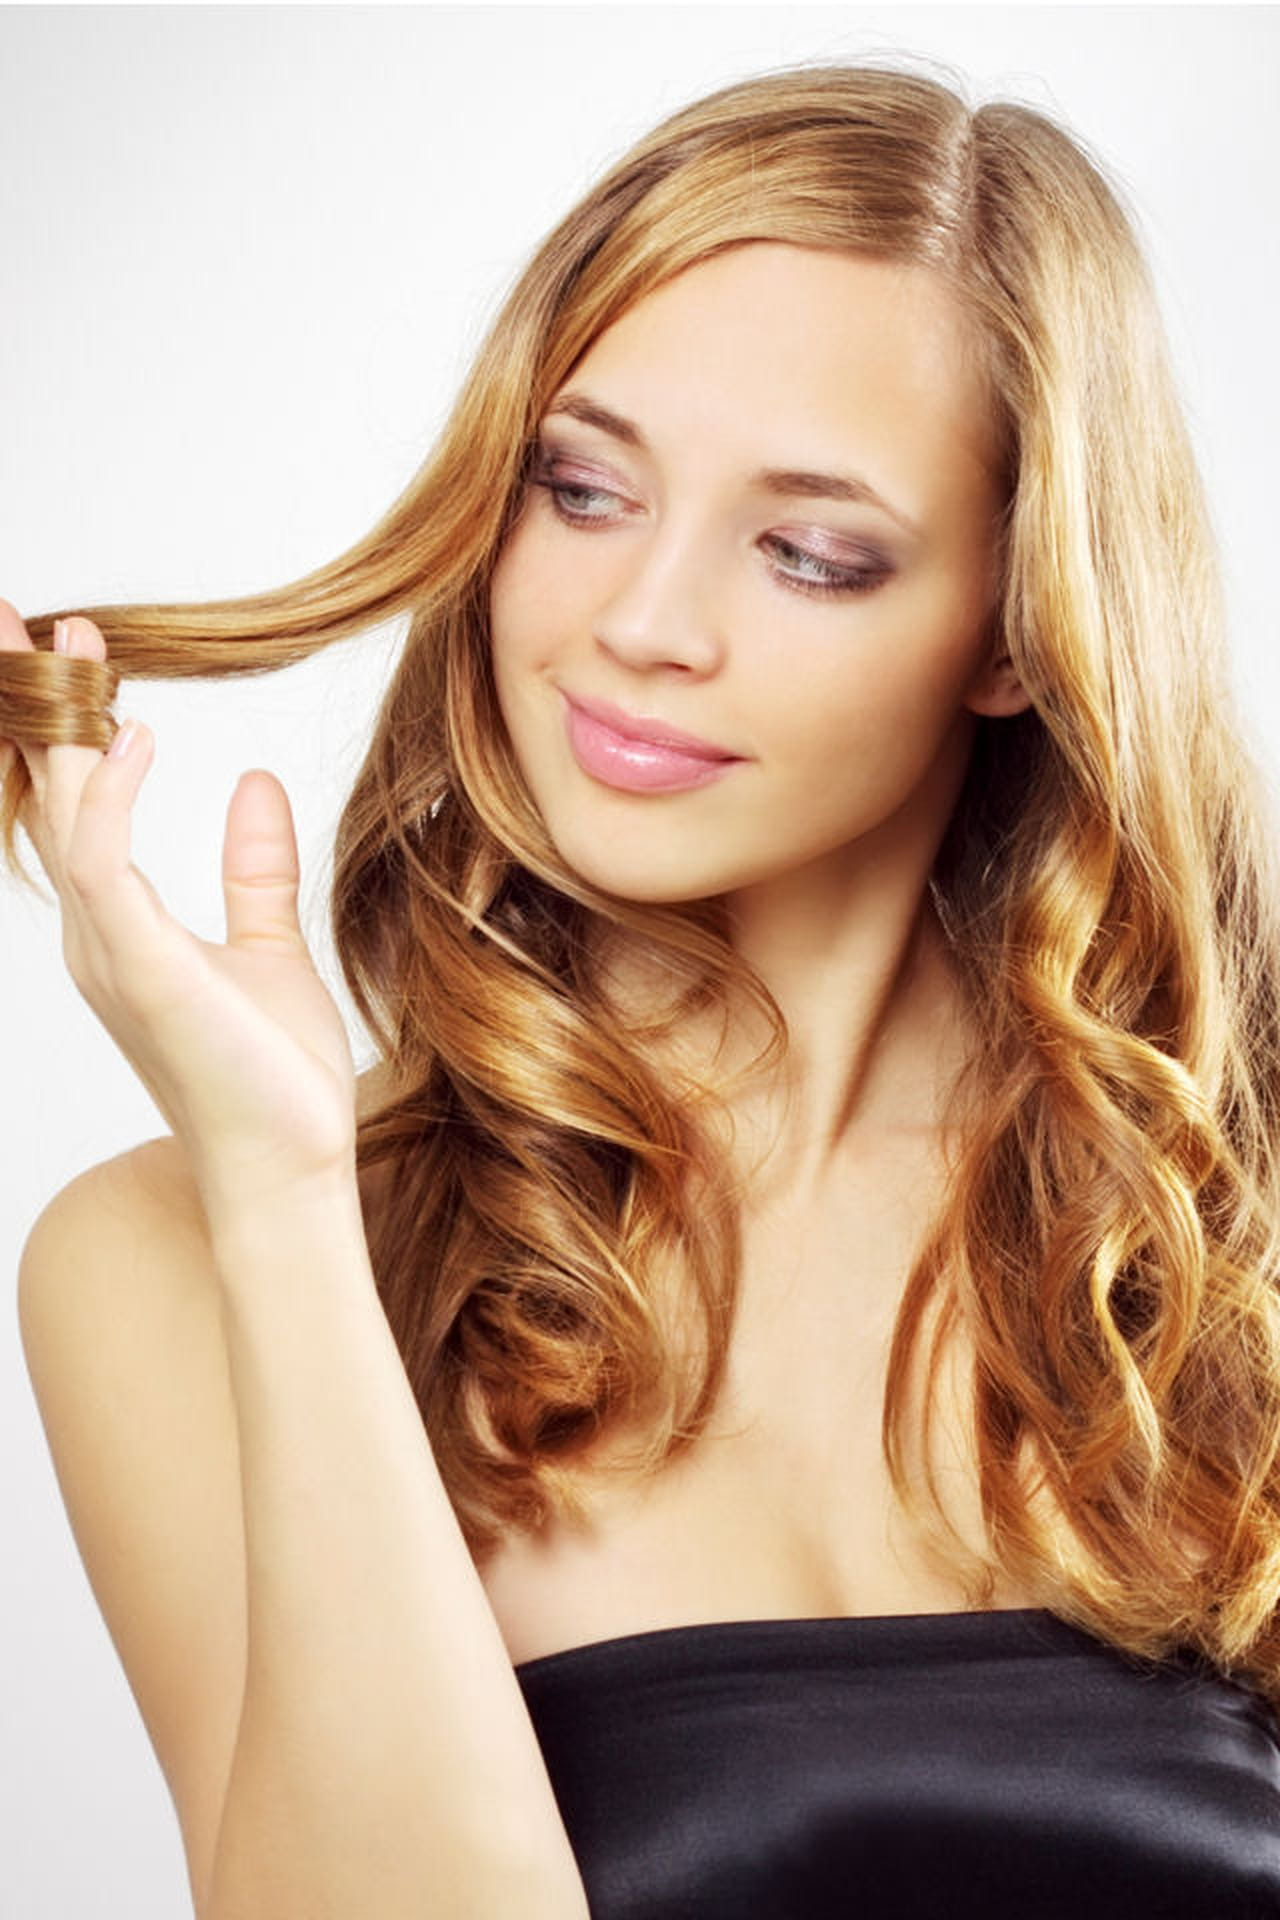 Trucchi per avere capelli lunghi